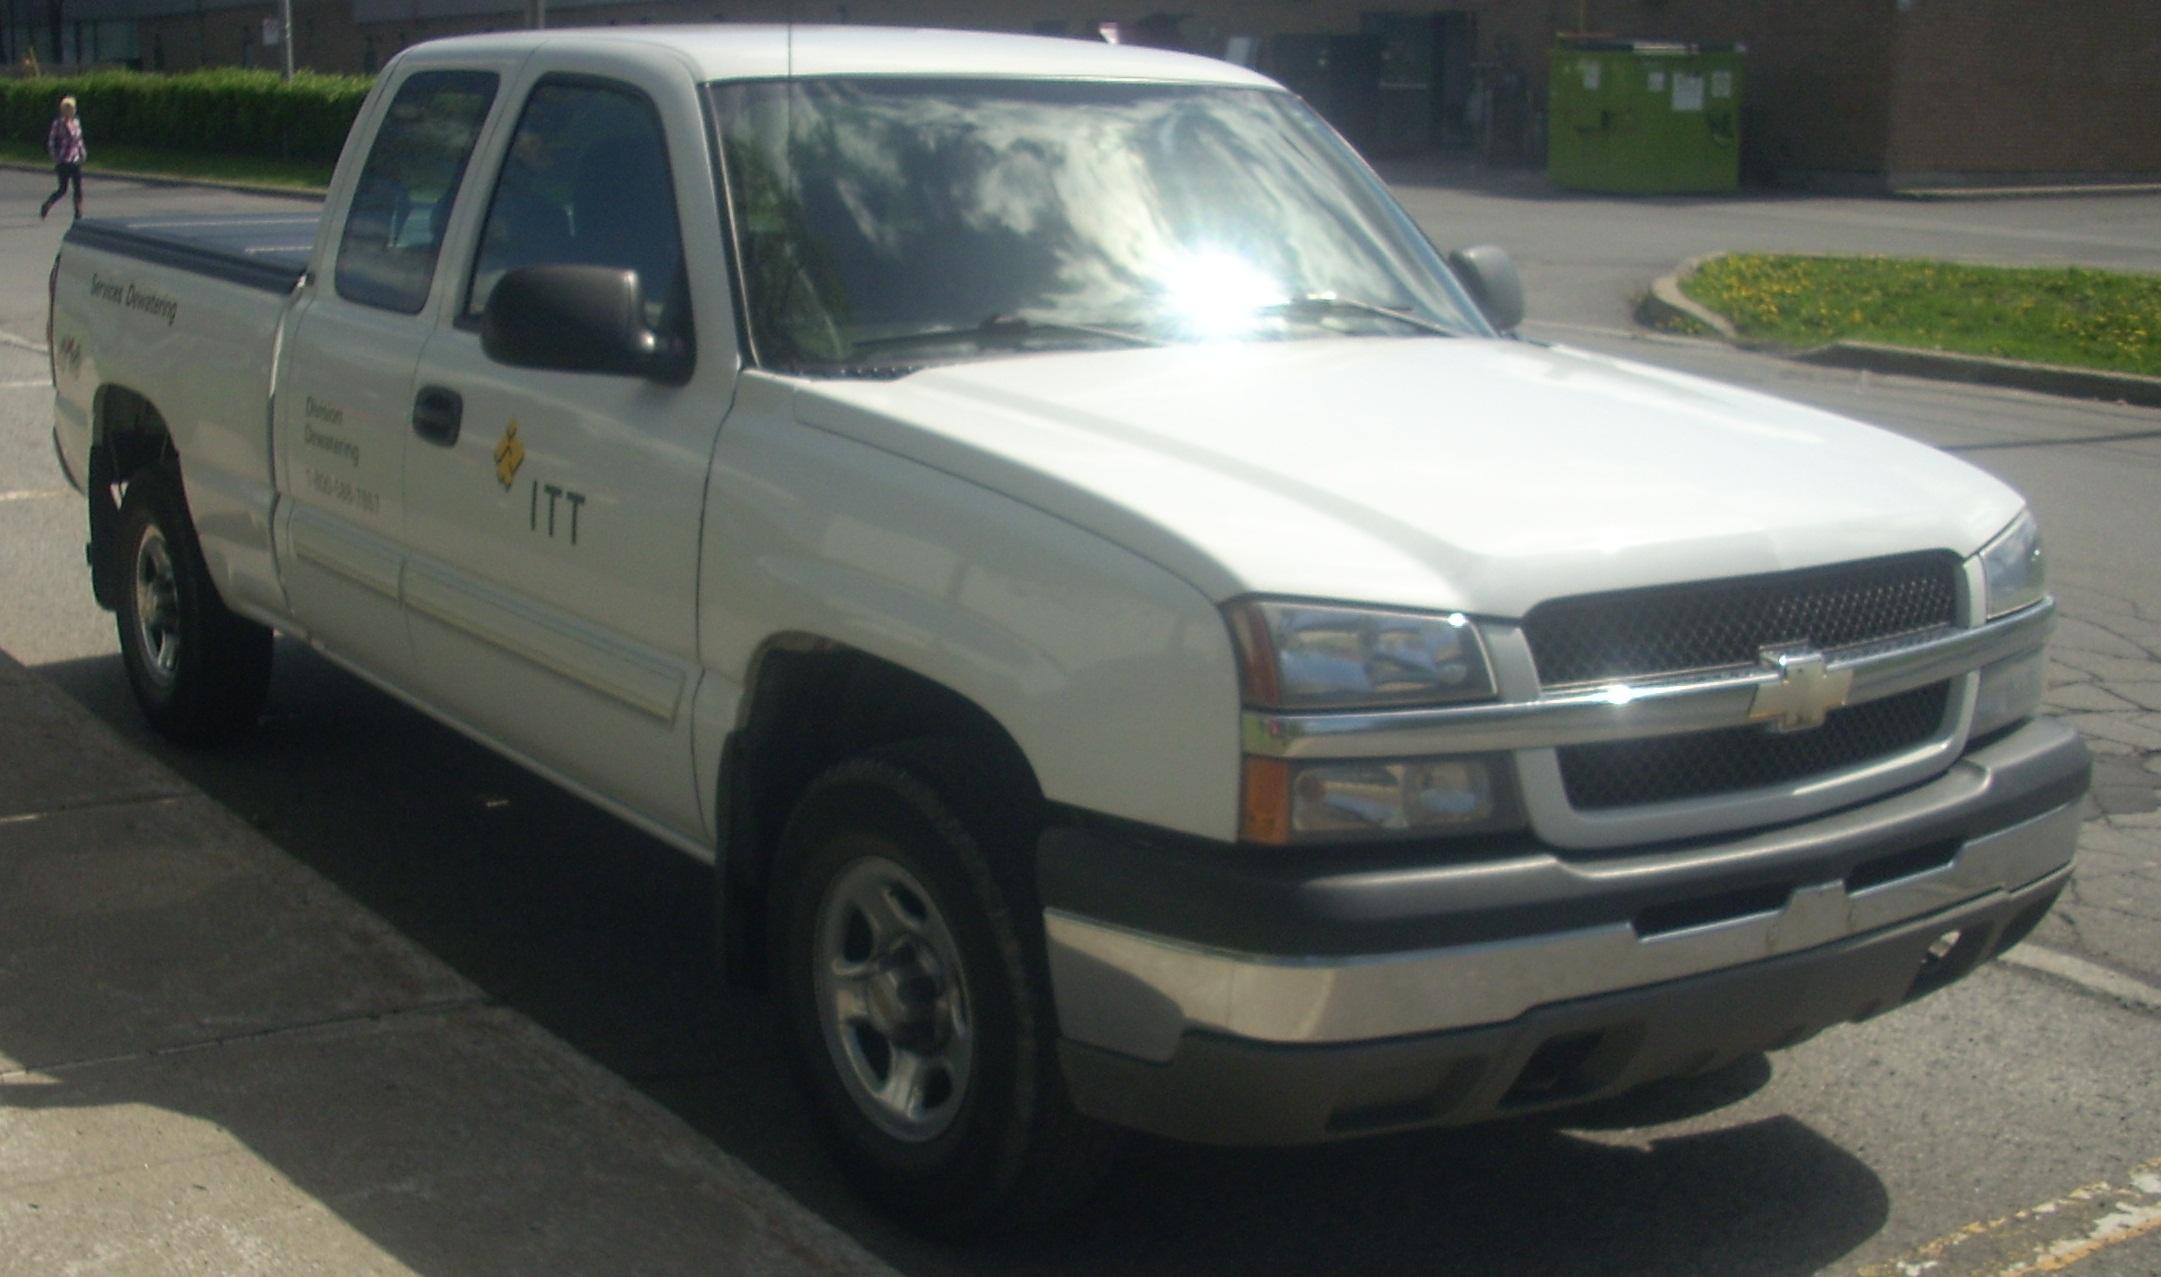 File:'03-'05 Chevrolet Silverado 1500 Extended Cab ITT.jpg - Wikimedia Commons